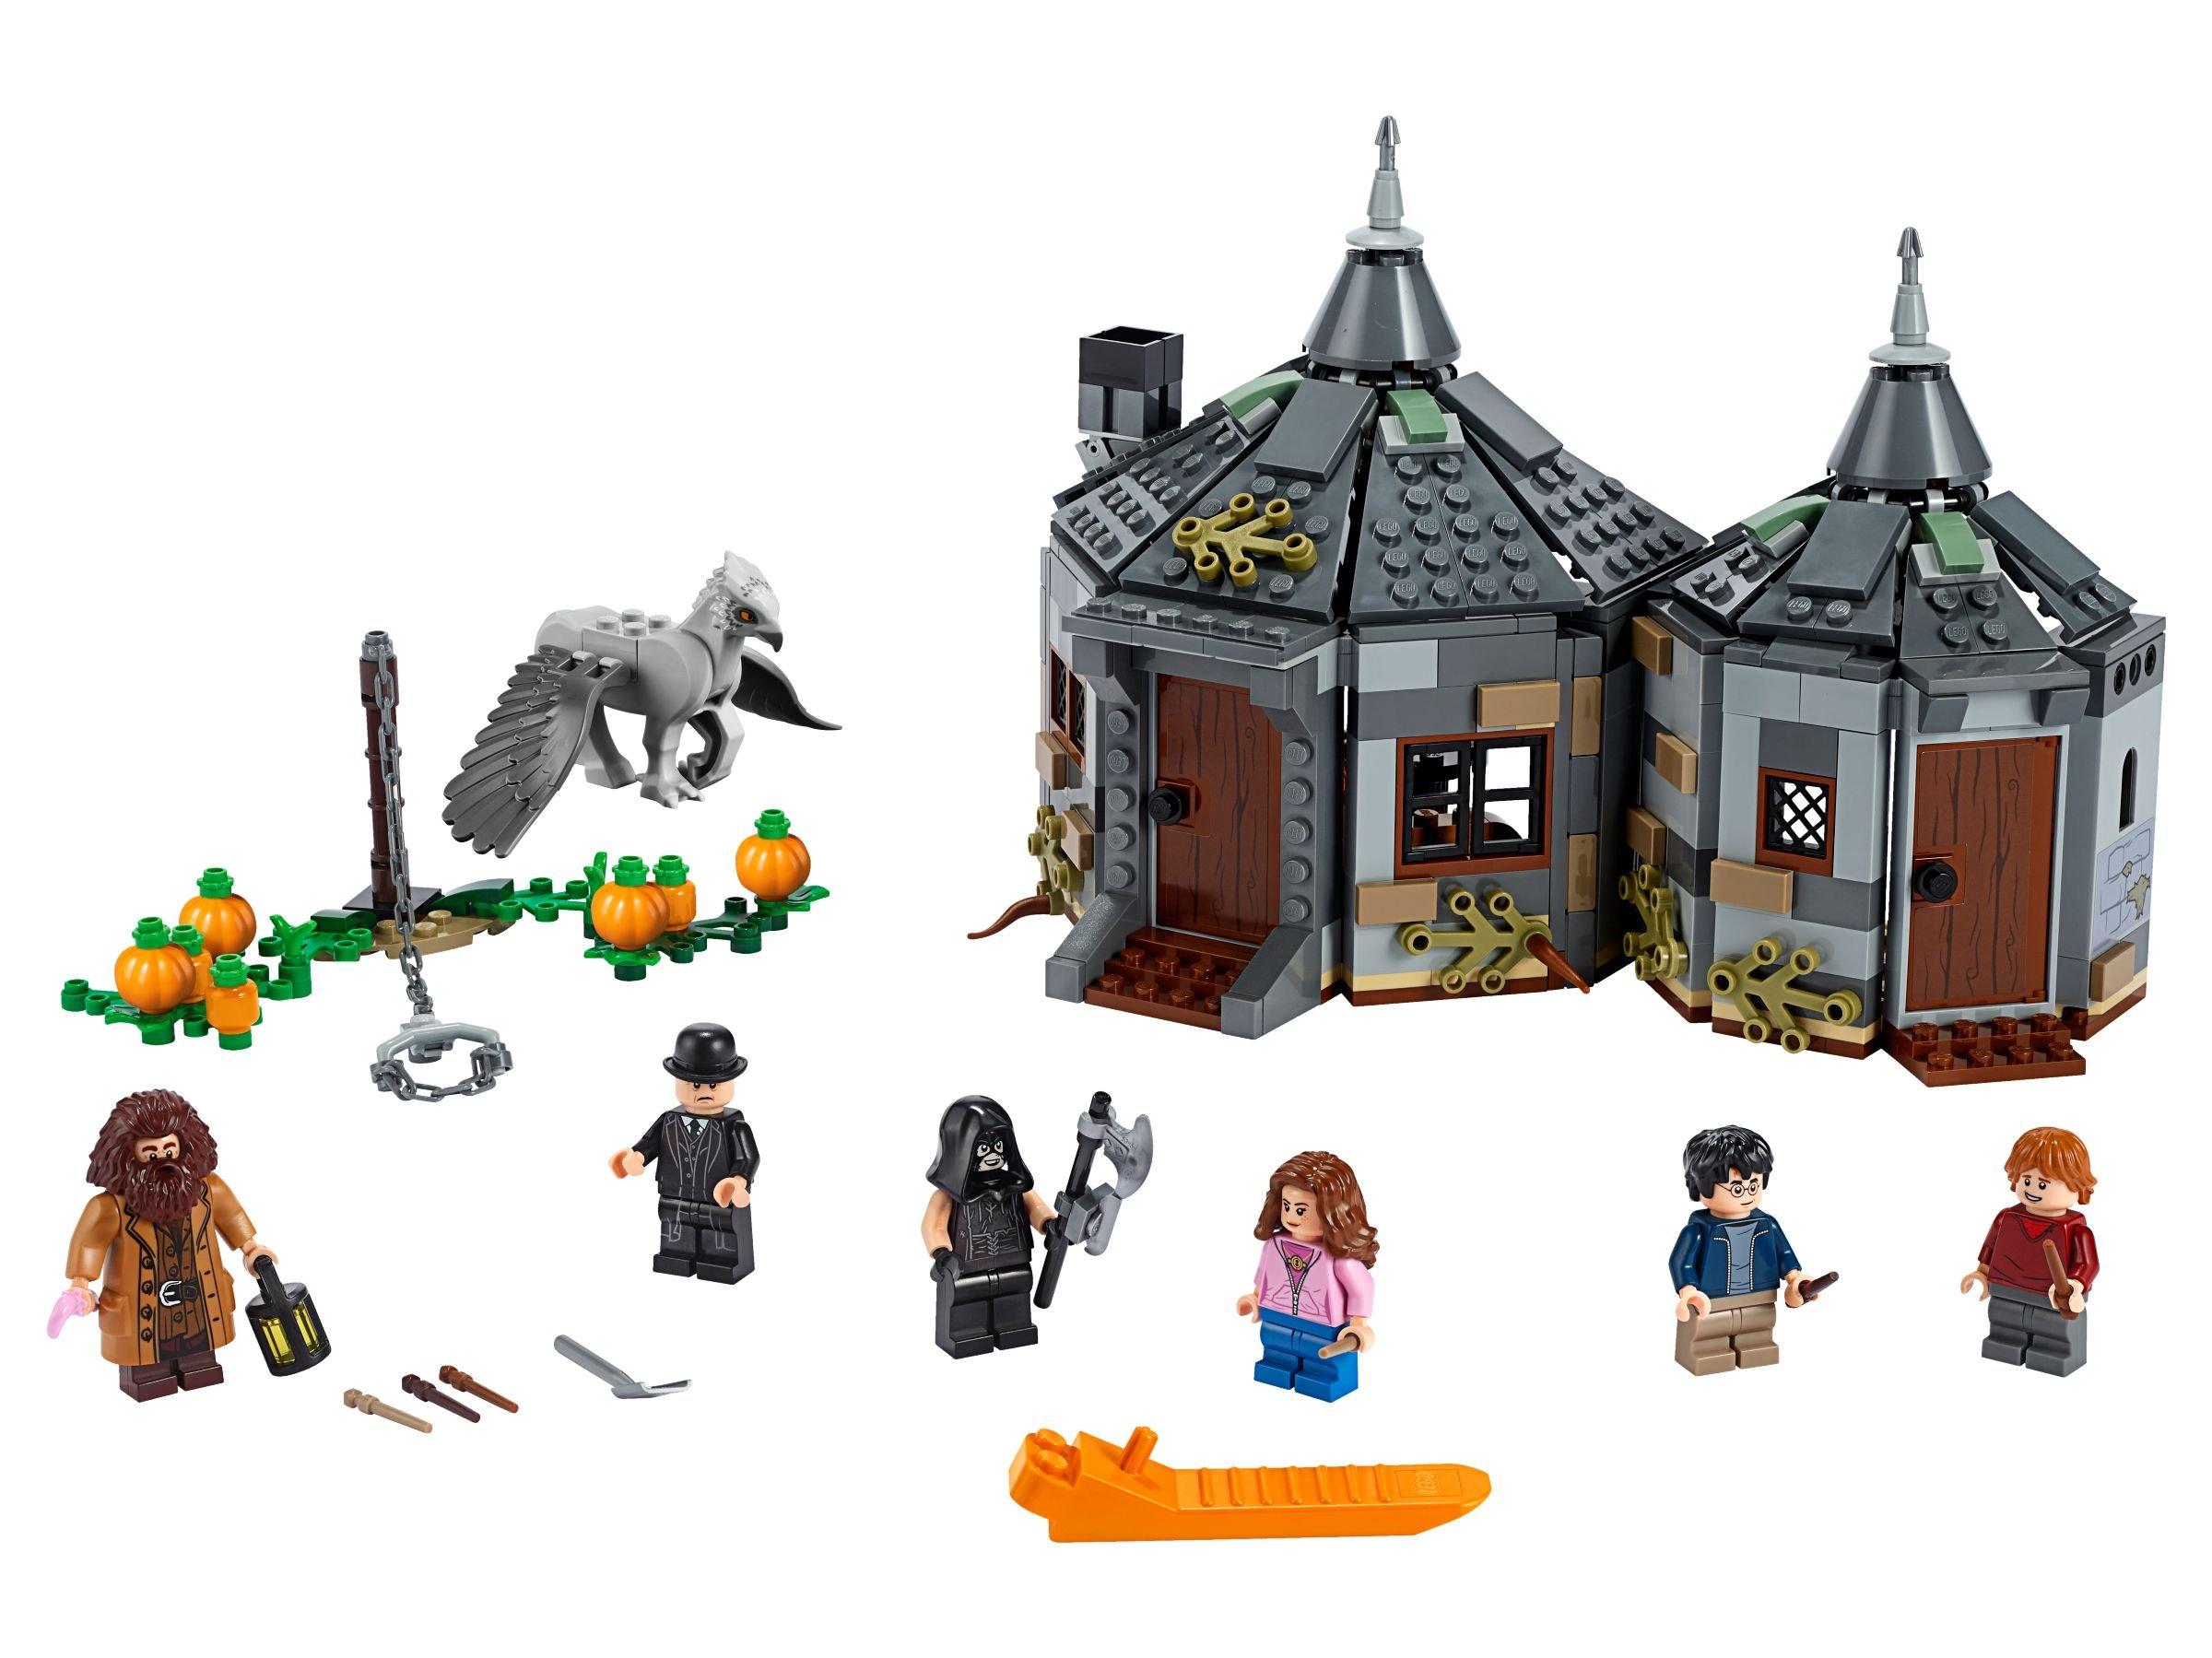 Lego Weihnachtskalender 2019.Lego 75947 Harry Potter Hagrids Hutte Seidenschnabels Rettung 2019 Hagrid S Hut